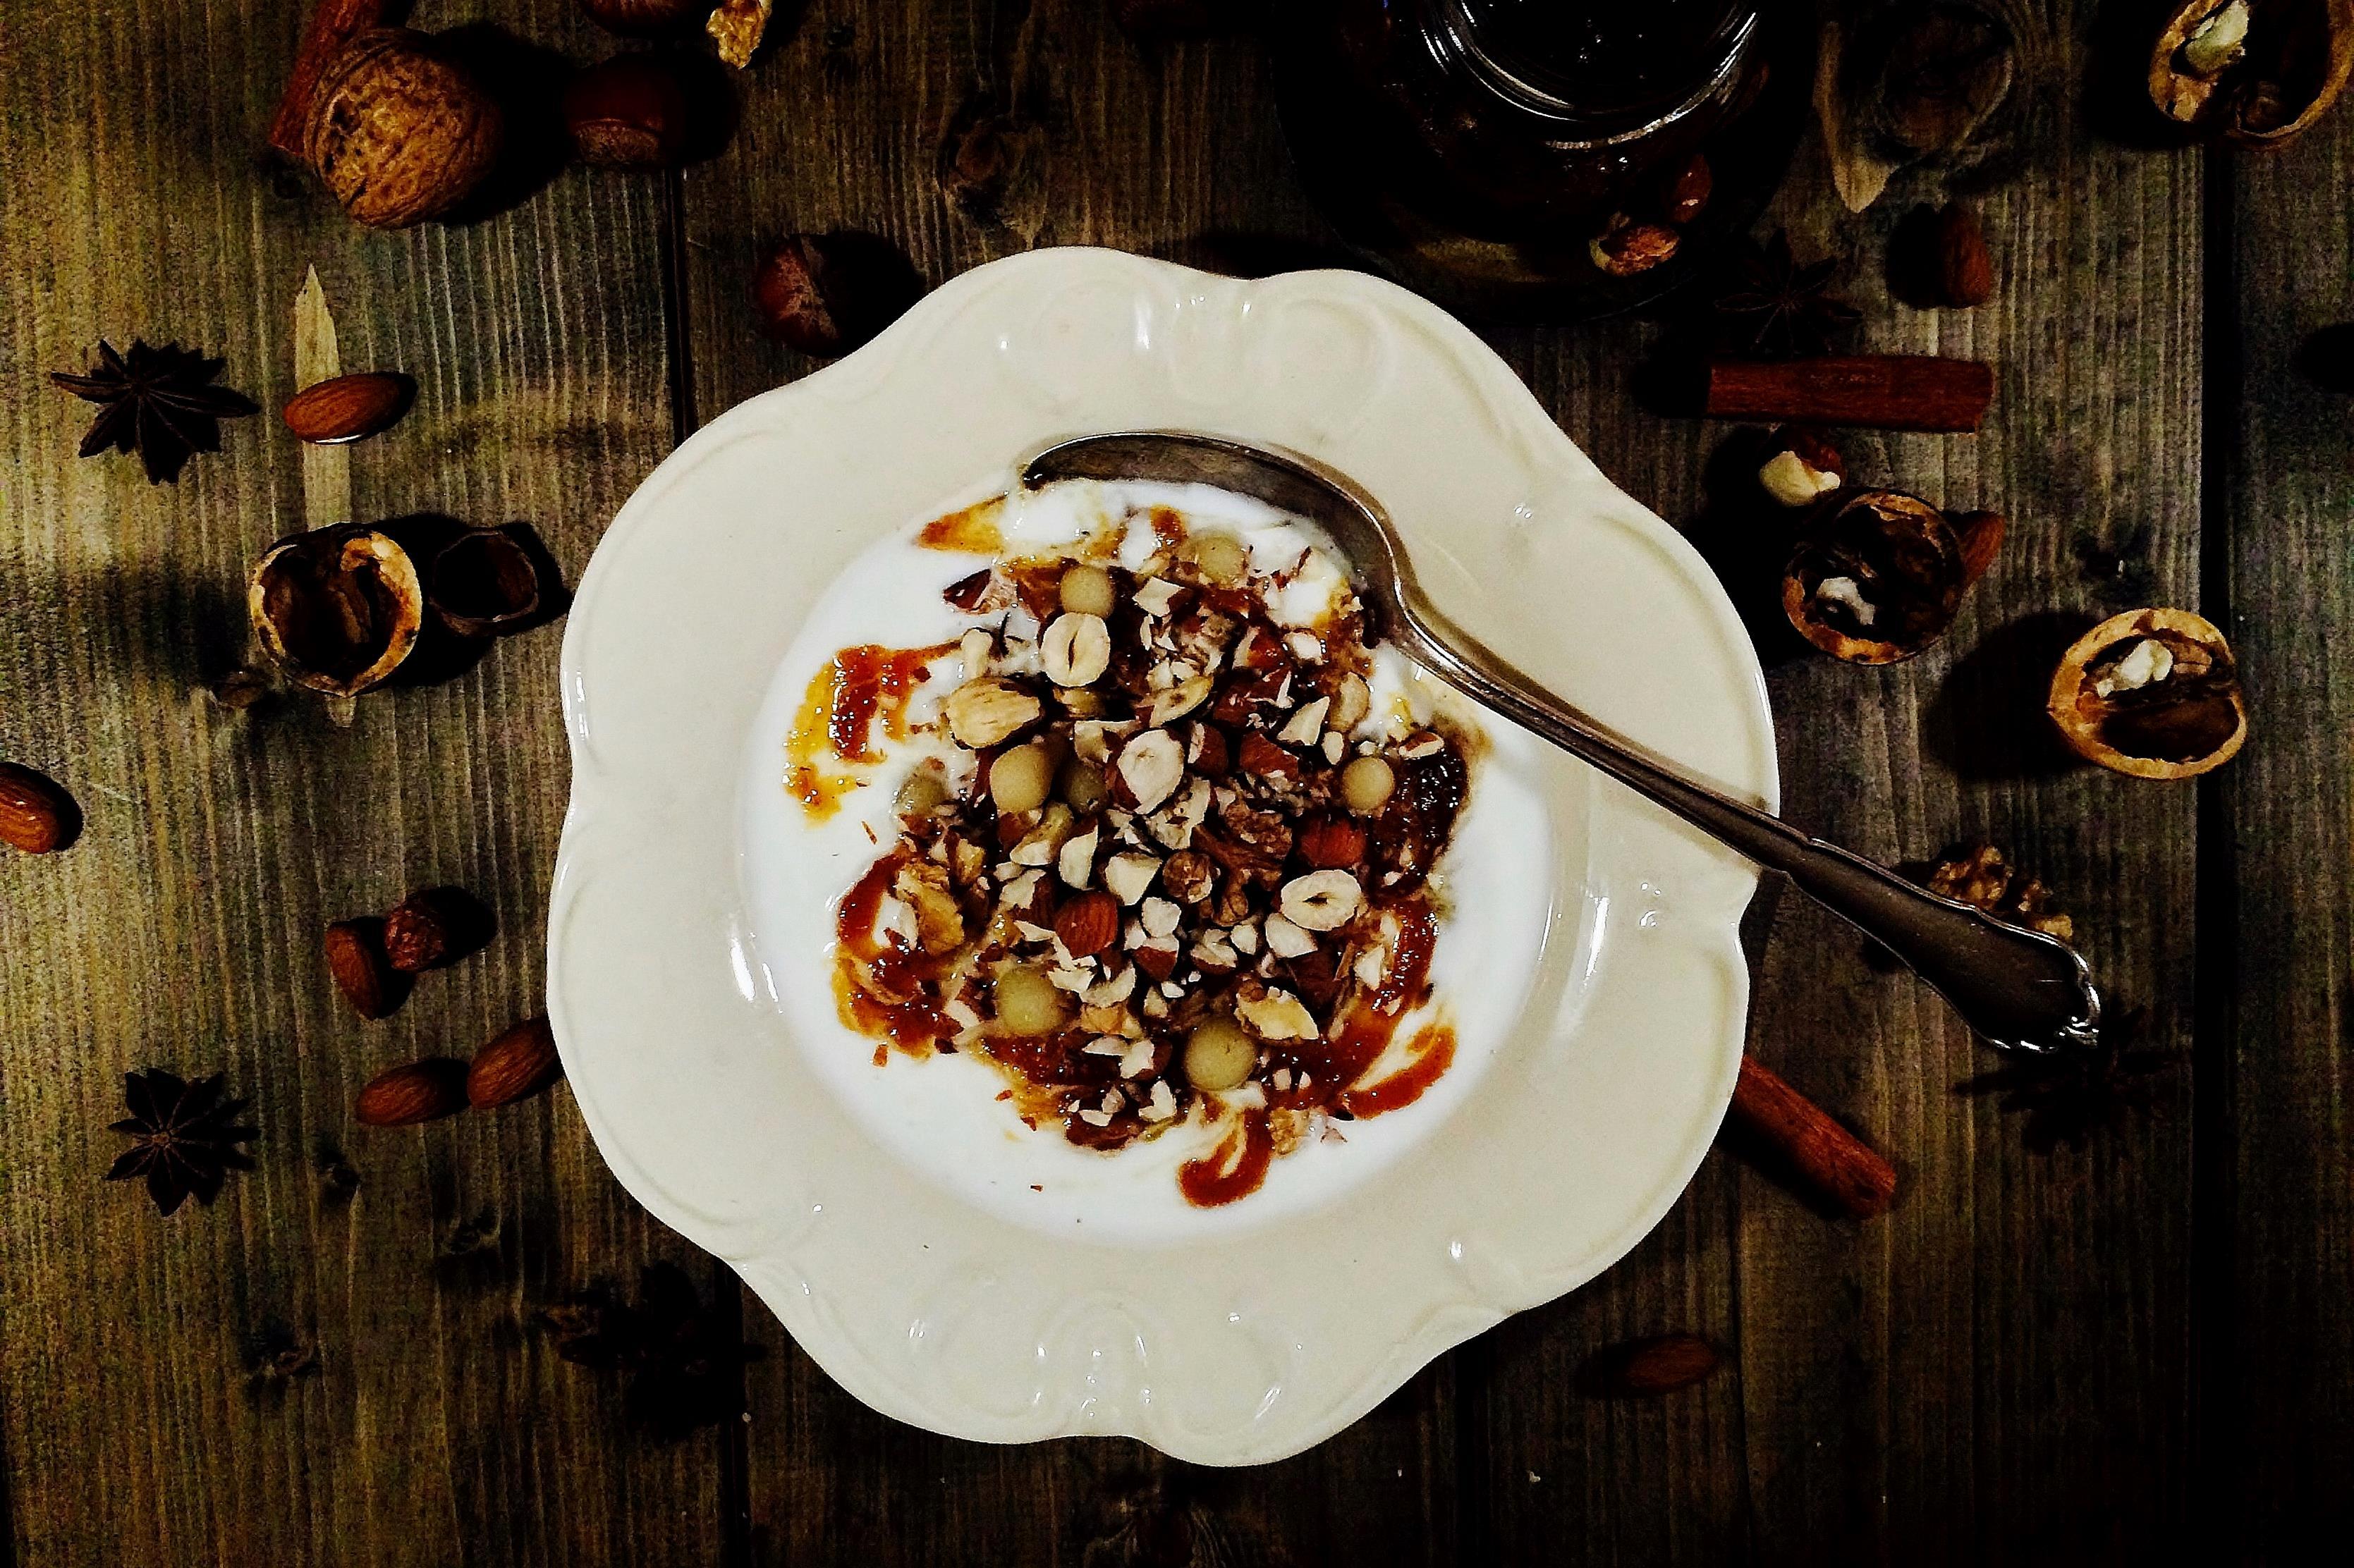 Yogurt, Nuts and Christmas Spiced Apple Chutney